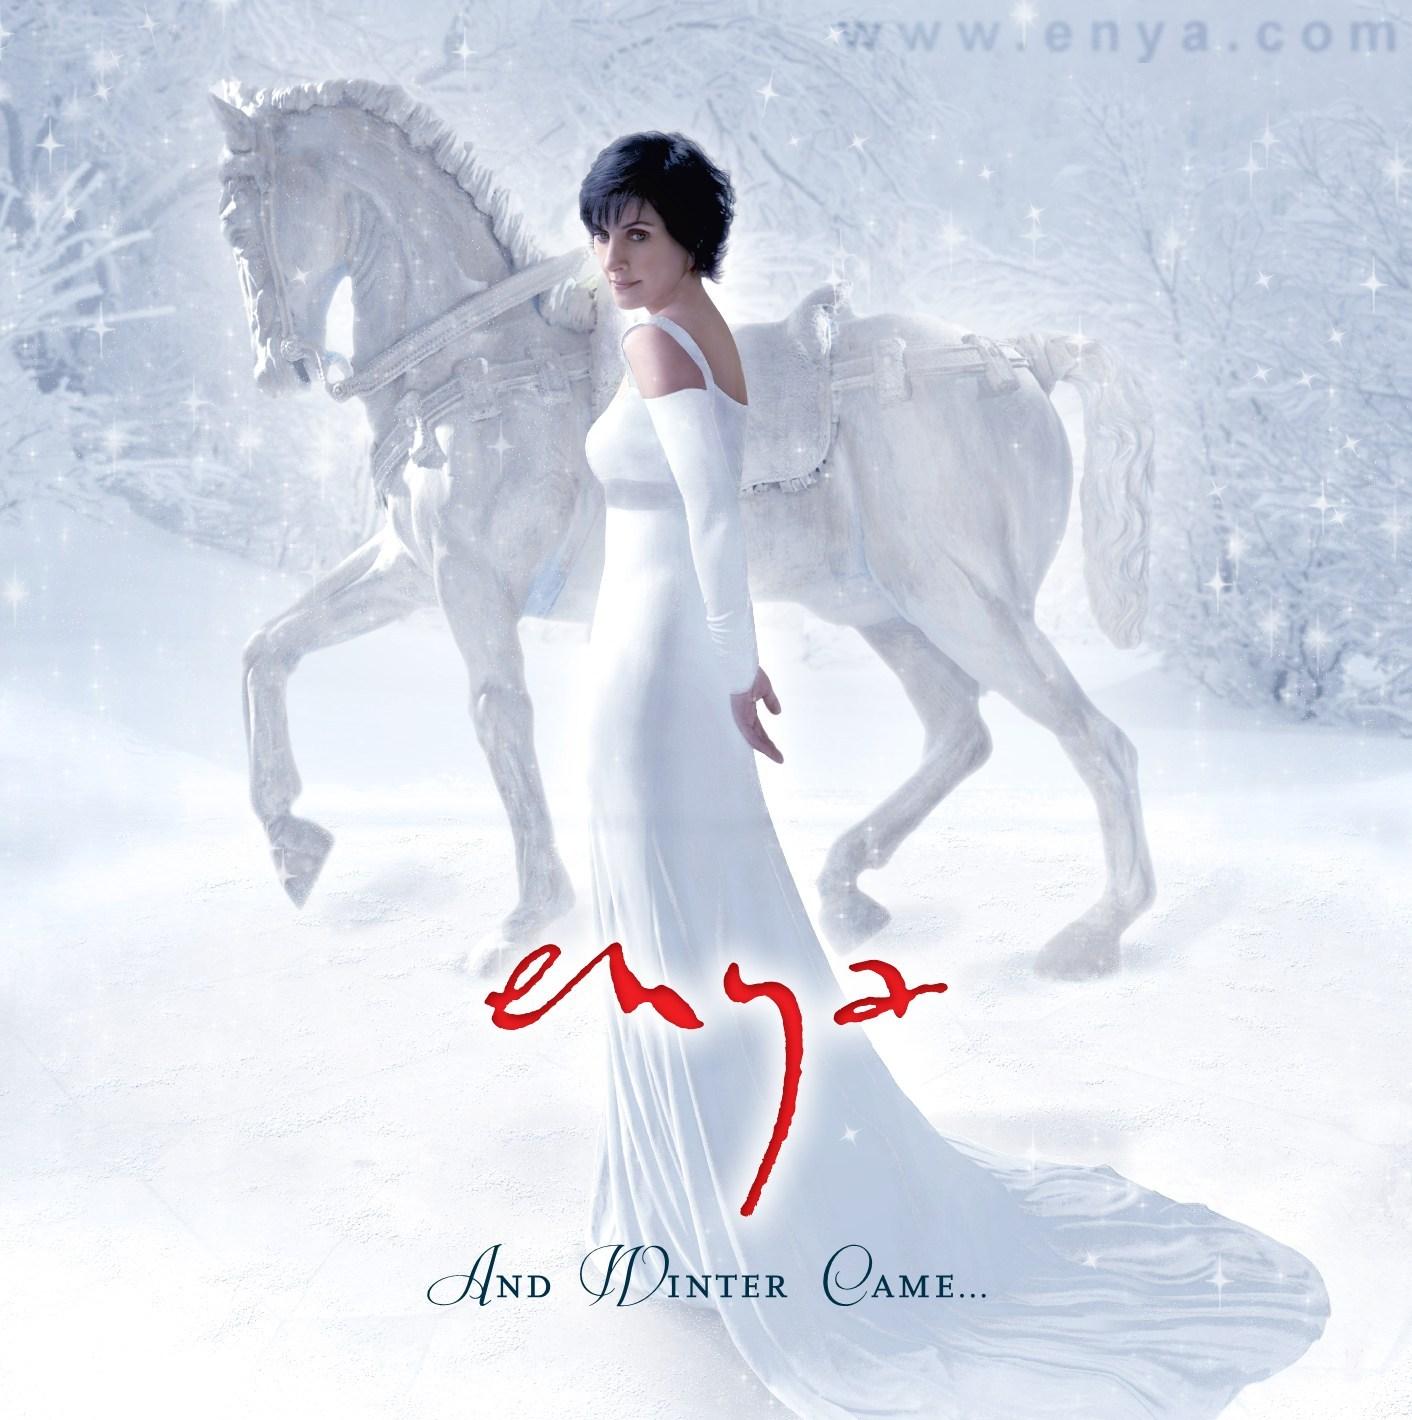 Nuevo disco de Enya And Winter Came fondos Enya wallpapers   enya 1412x1420